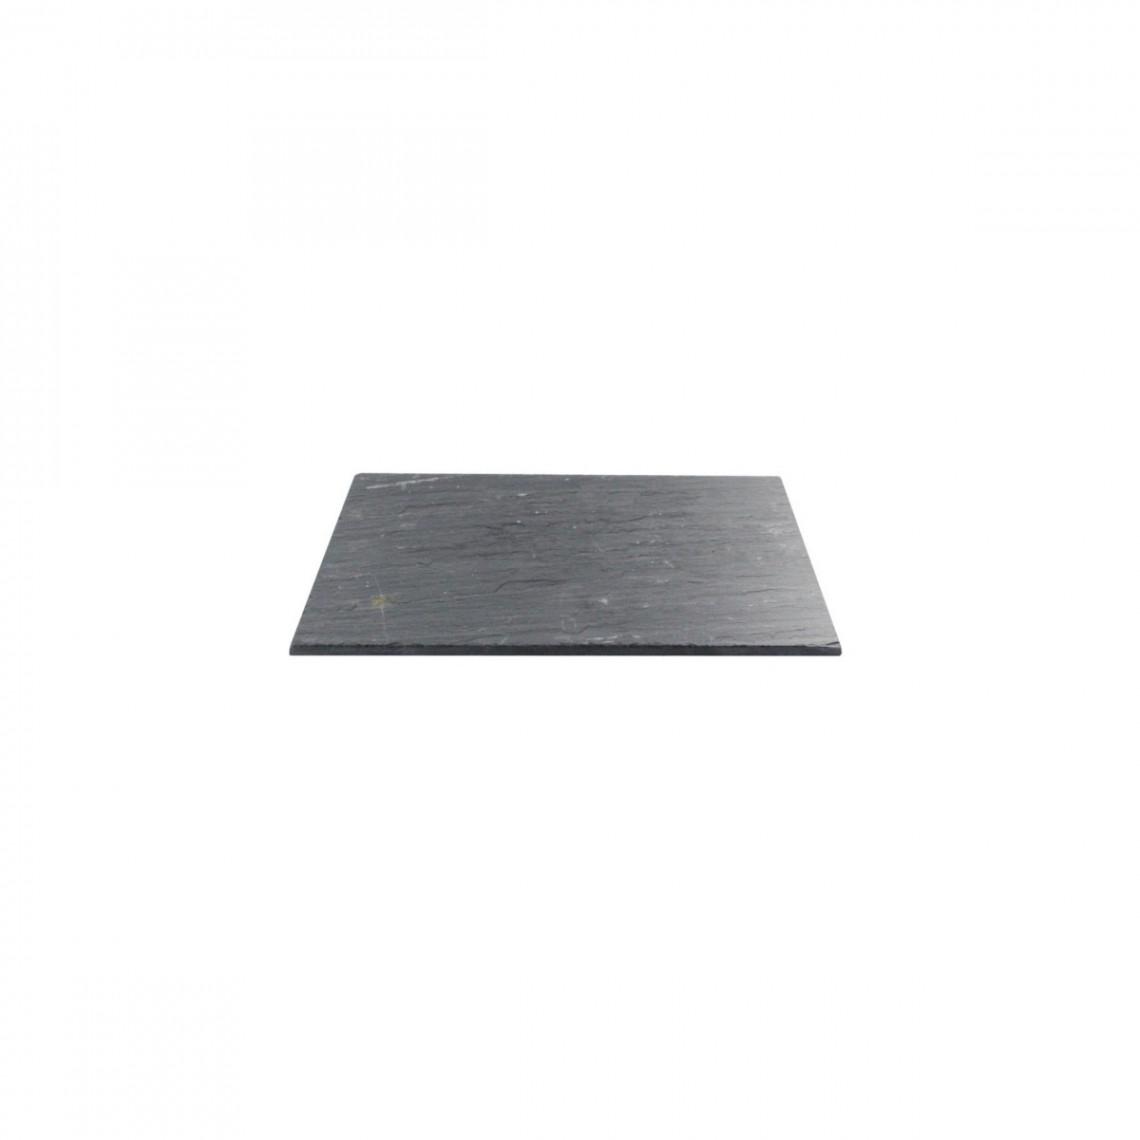 Plateau main ardoise (14 x 22 cm)